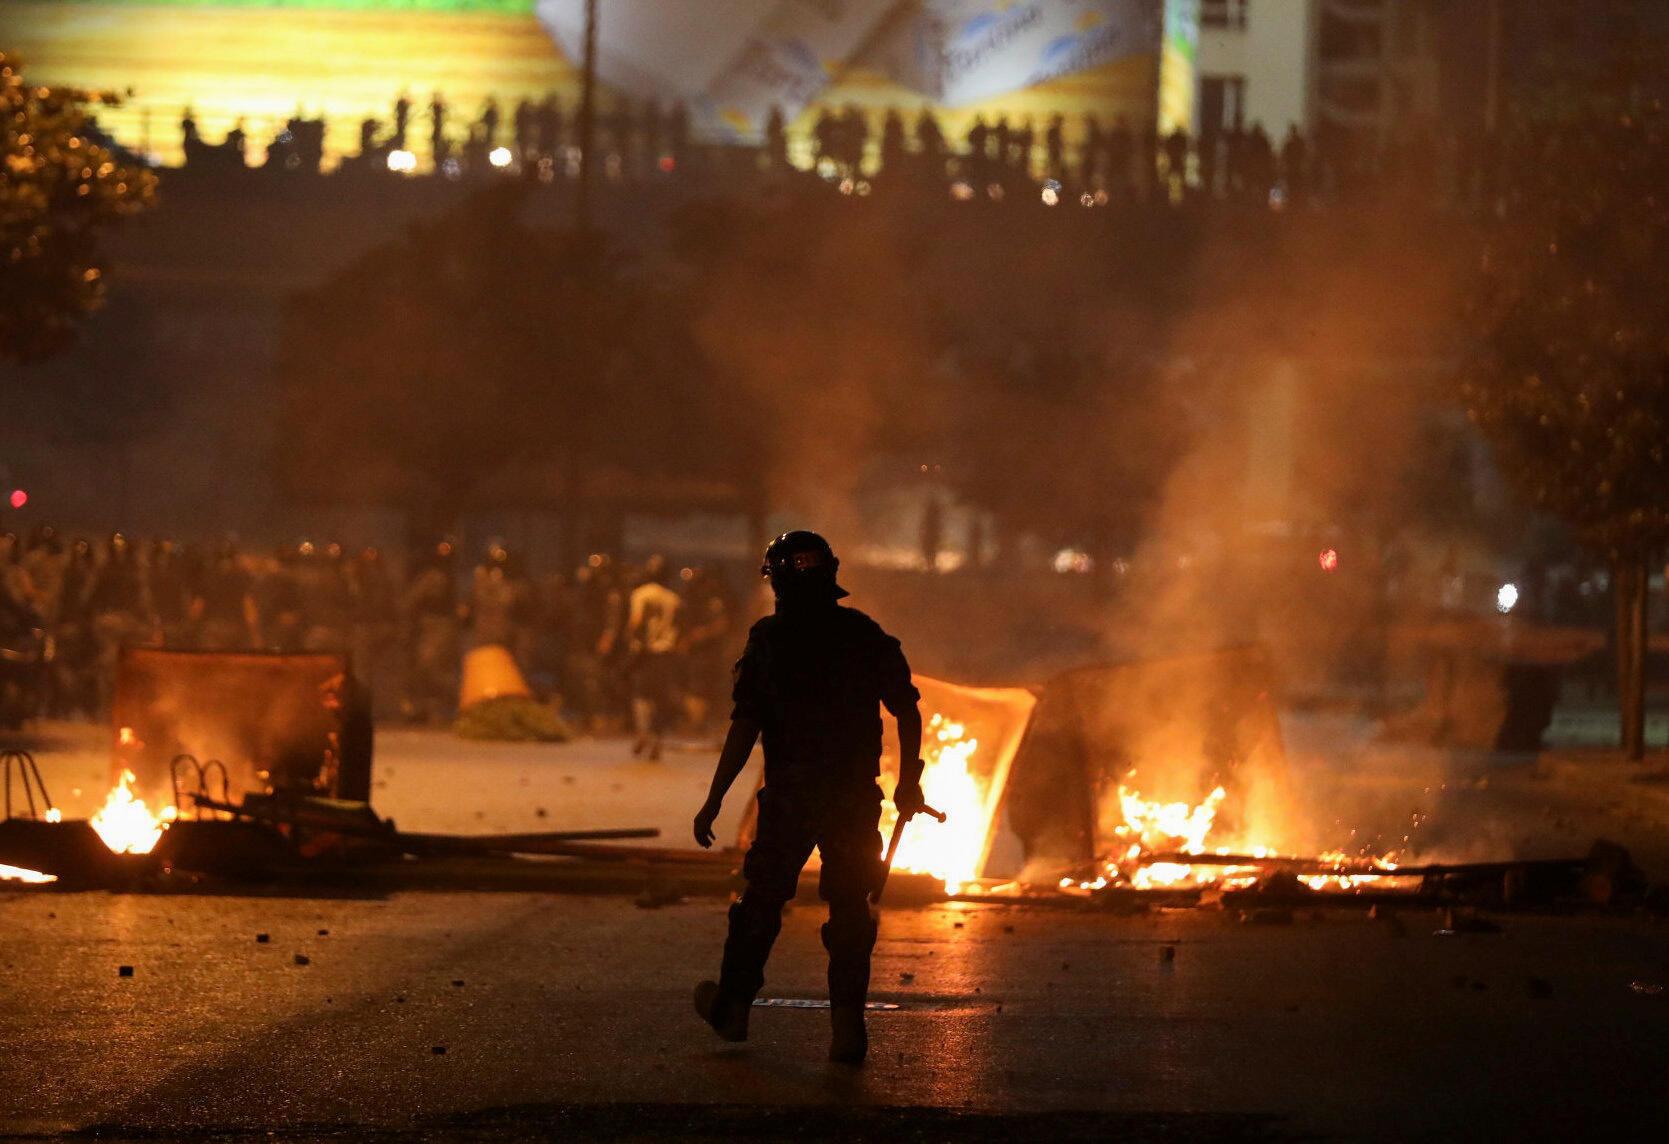 2020-06-12T000000Z_1746067494_RC2W7H951JQV_RTRMADP_3_LEBANON-CRISIS-PROTESTS